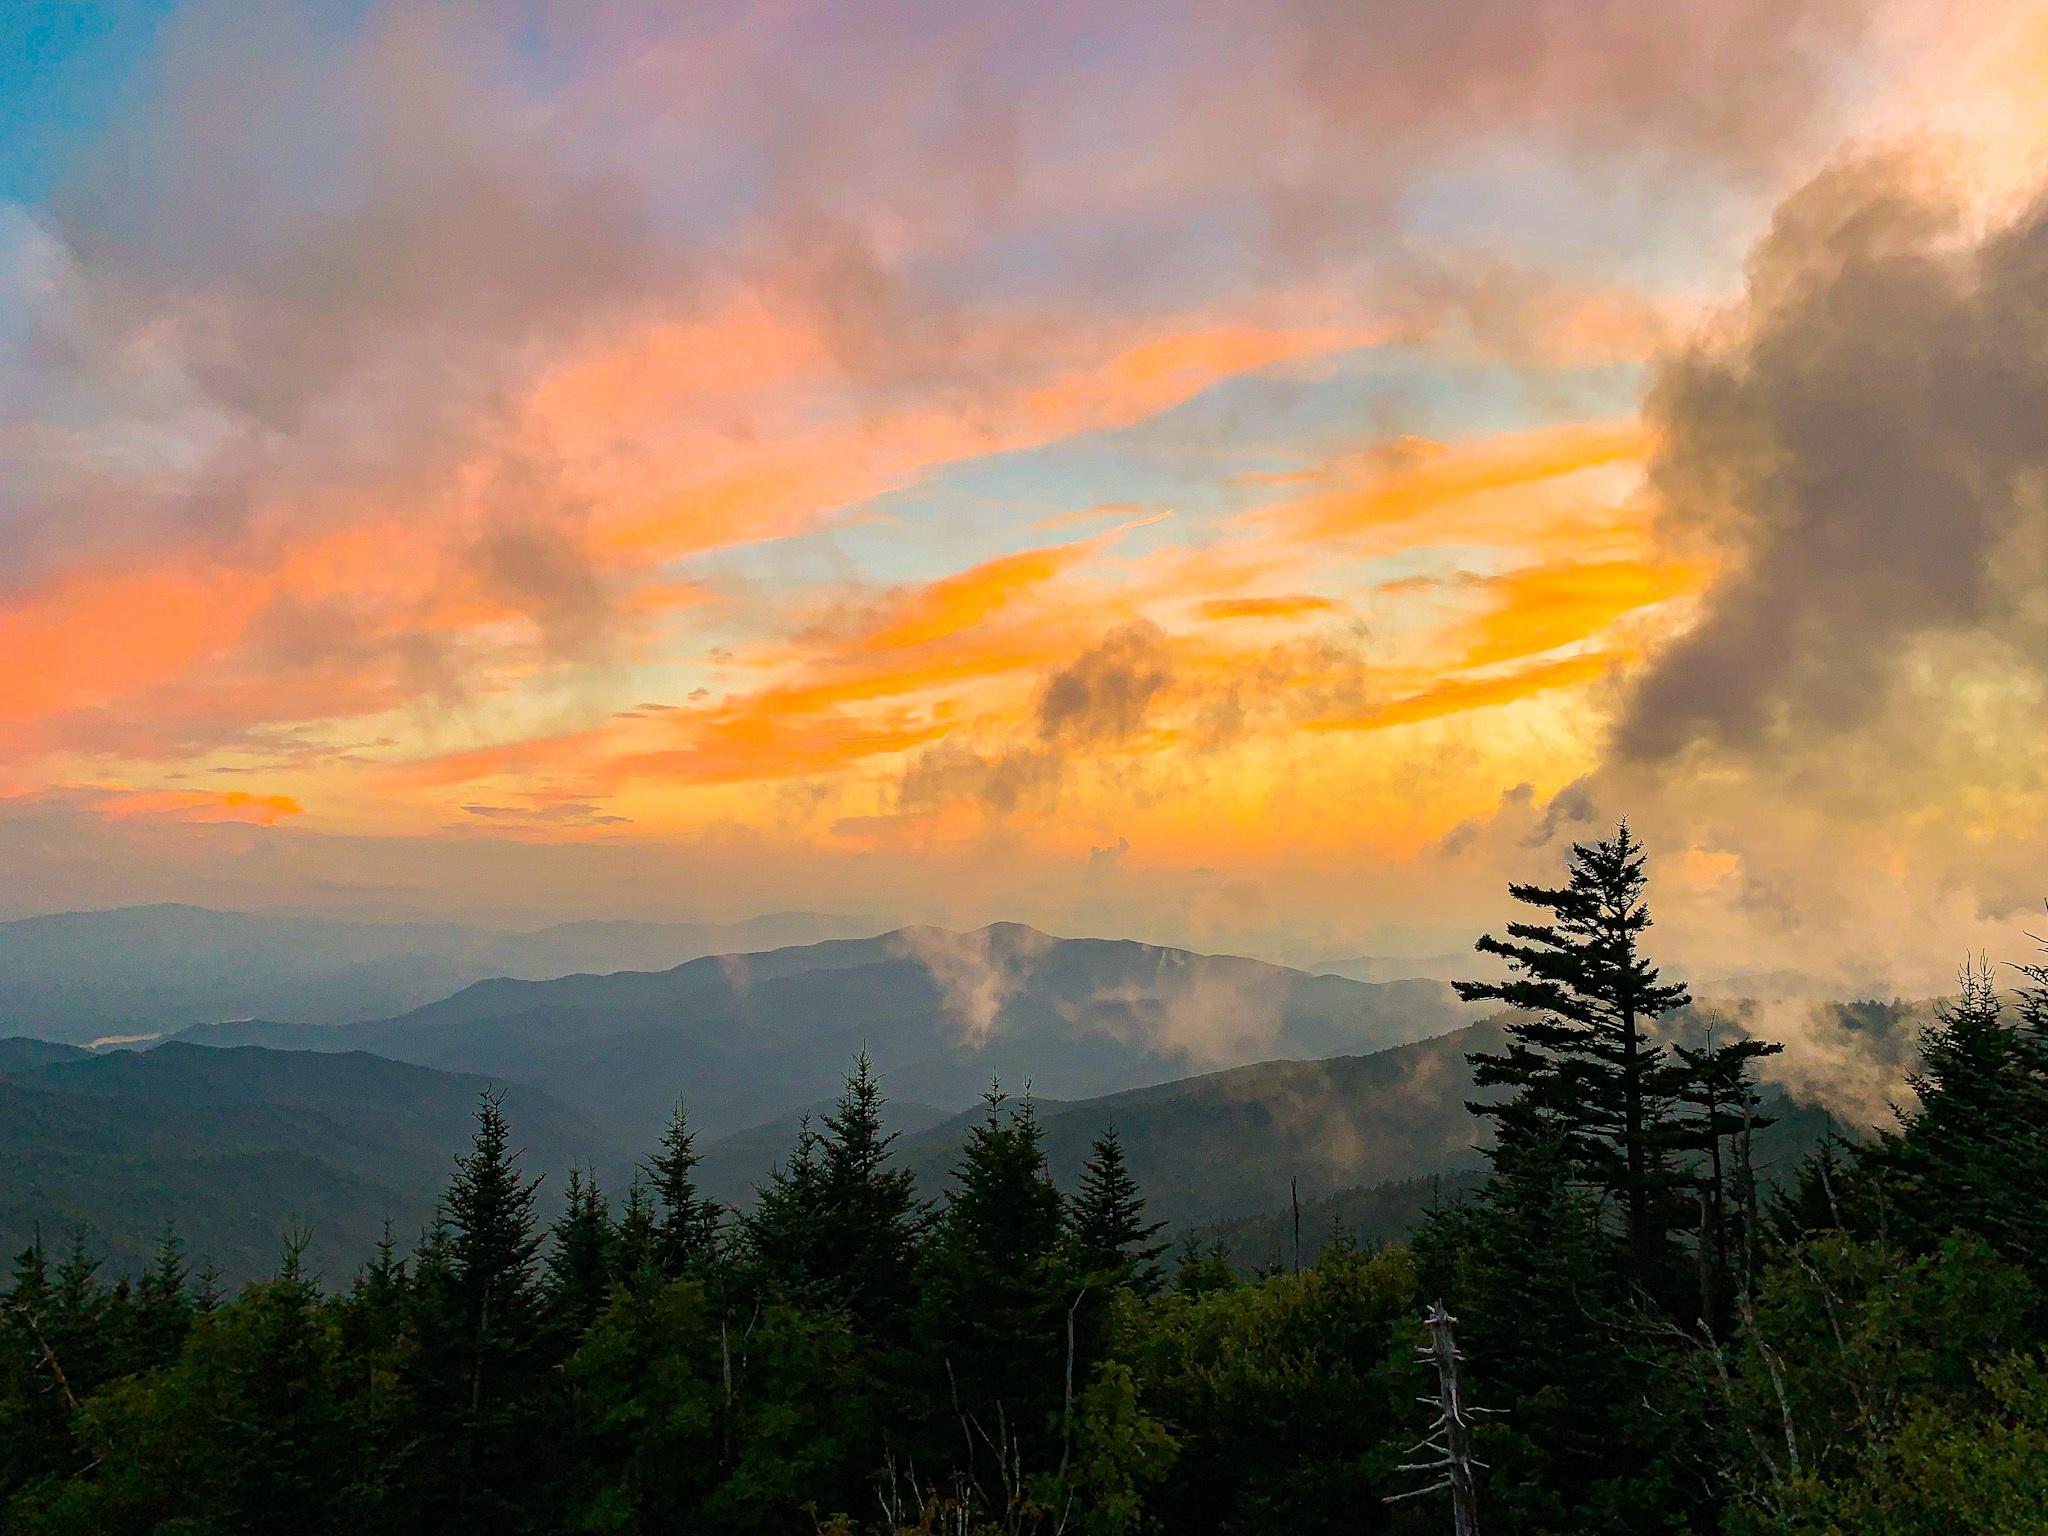 2021 Calendar Winners Announced - Tennessee Wildlife Federation intended for Rut Calendar 2021